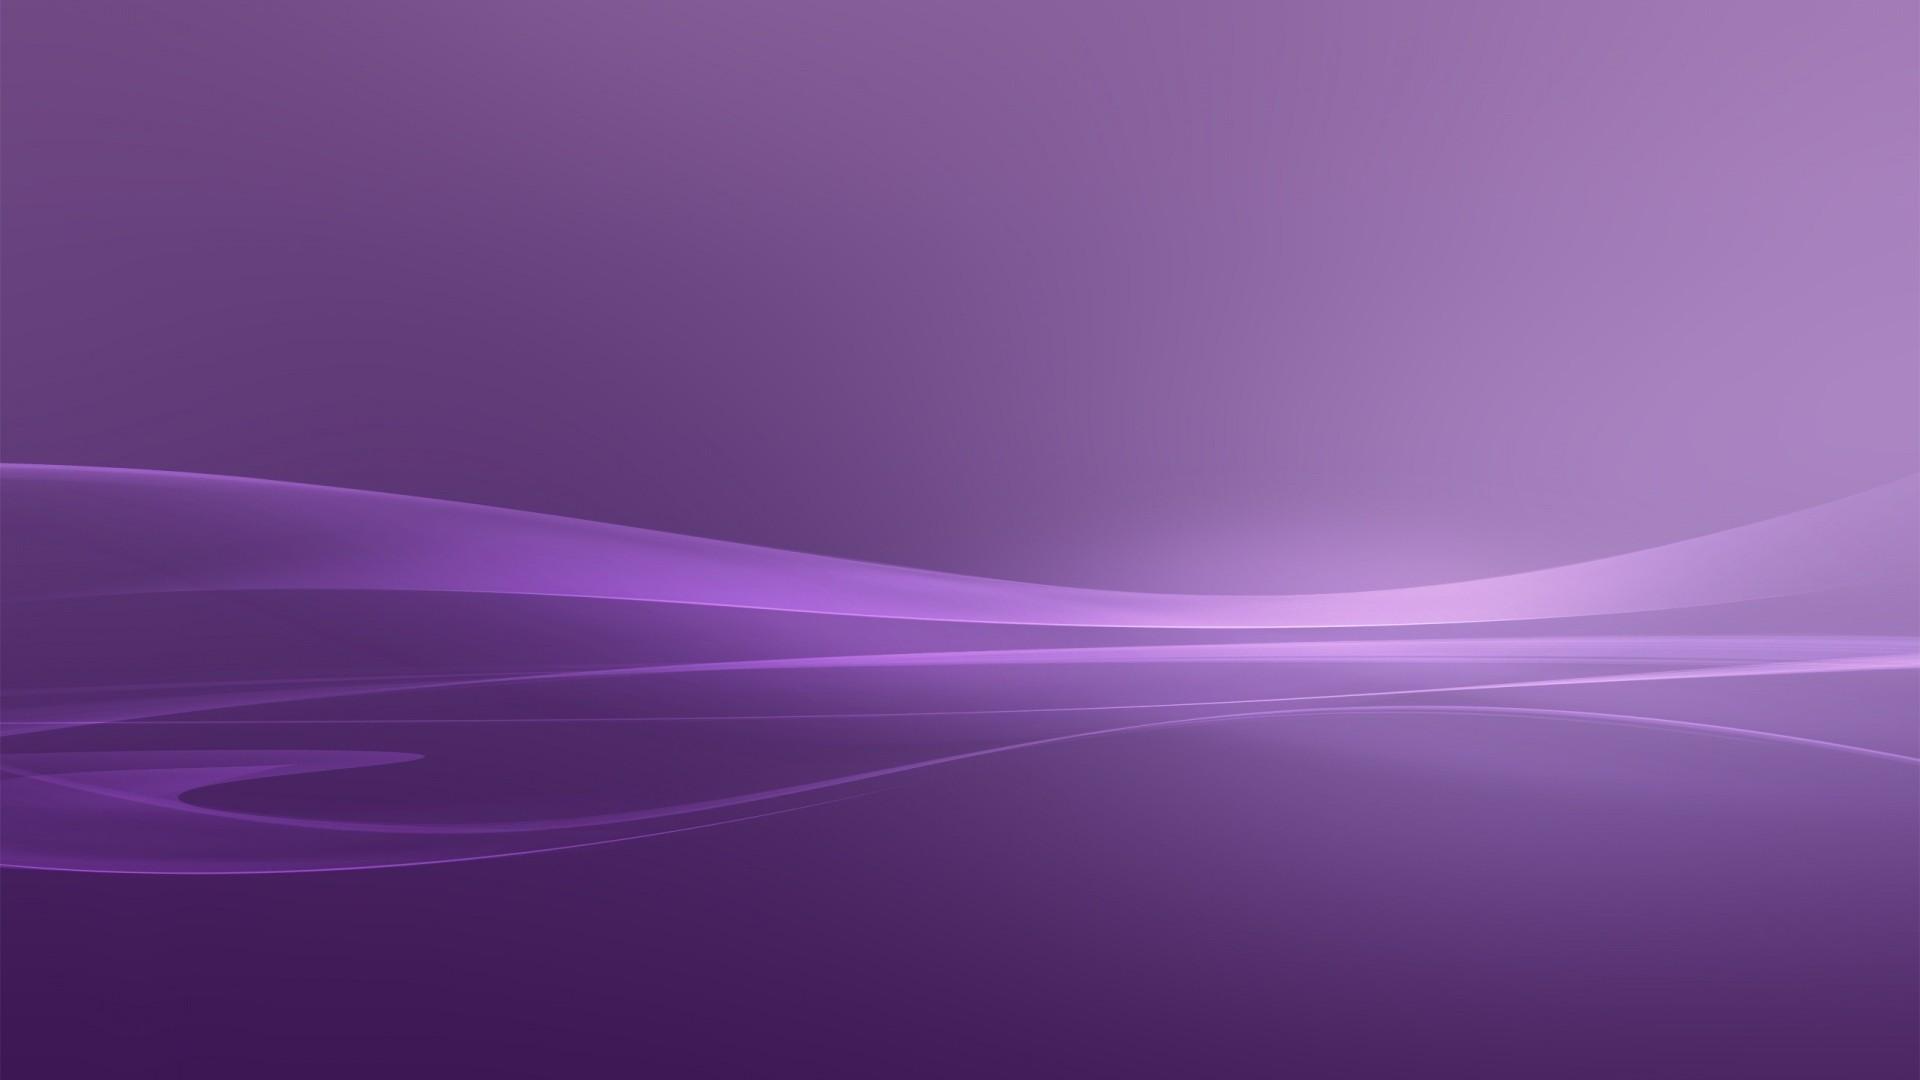 Wallpaper purple, light, solid, lines